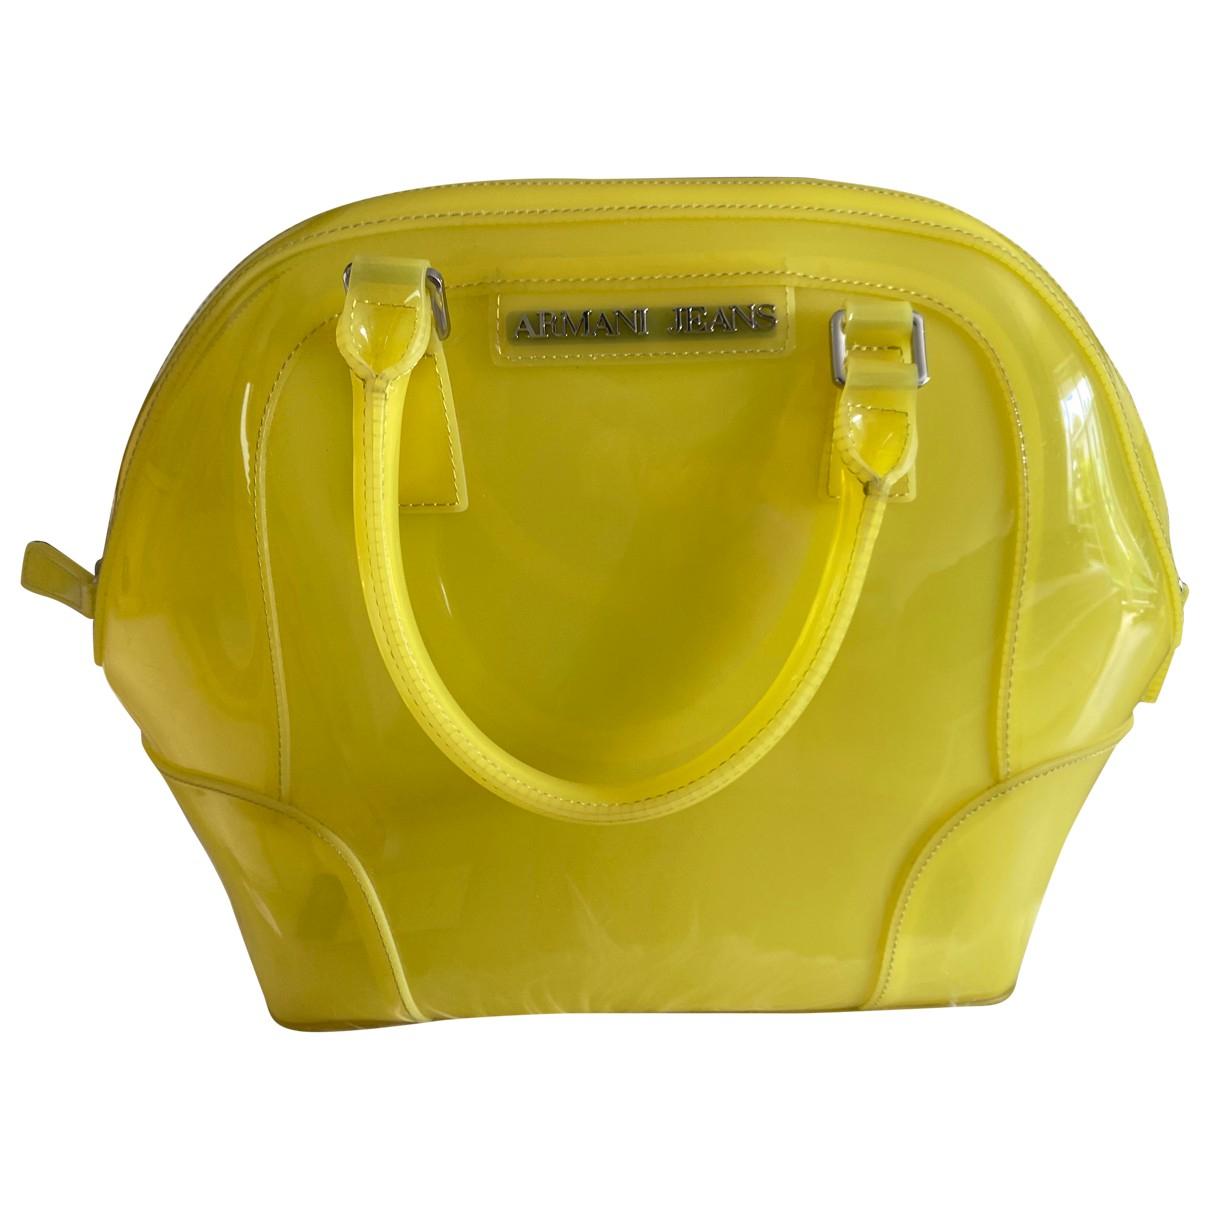 Armani Jeans \N Handtasche in  Gelb Kunststoff